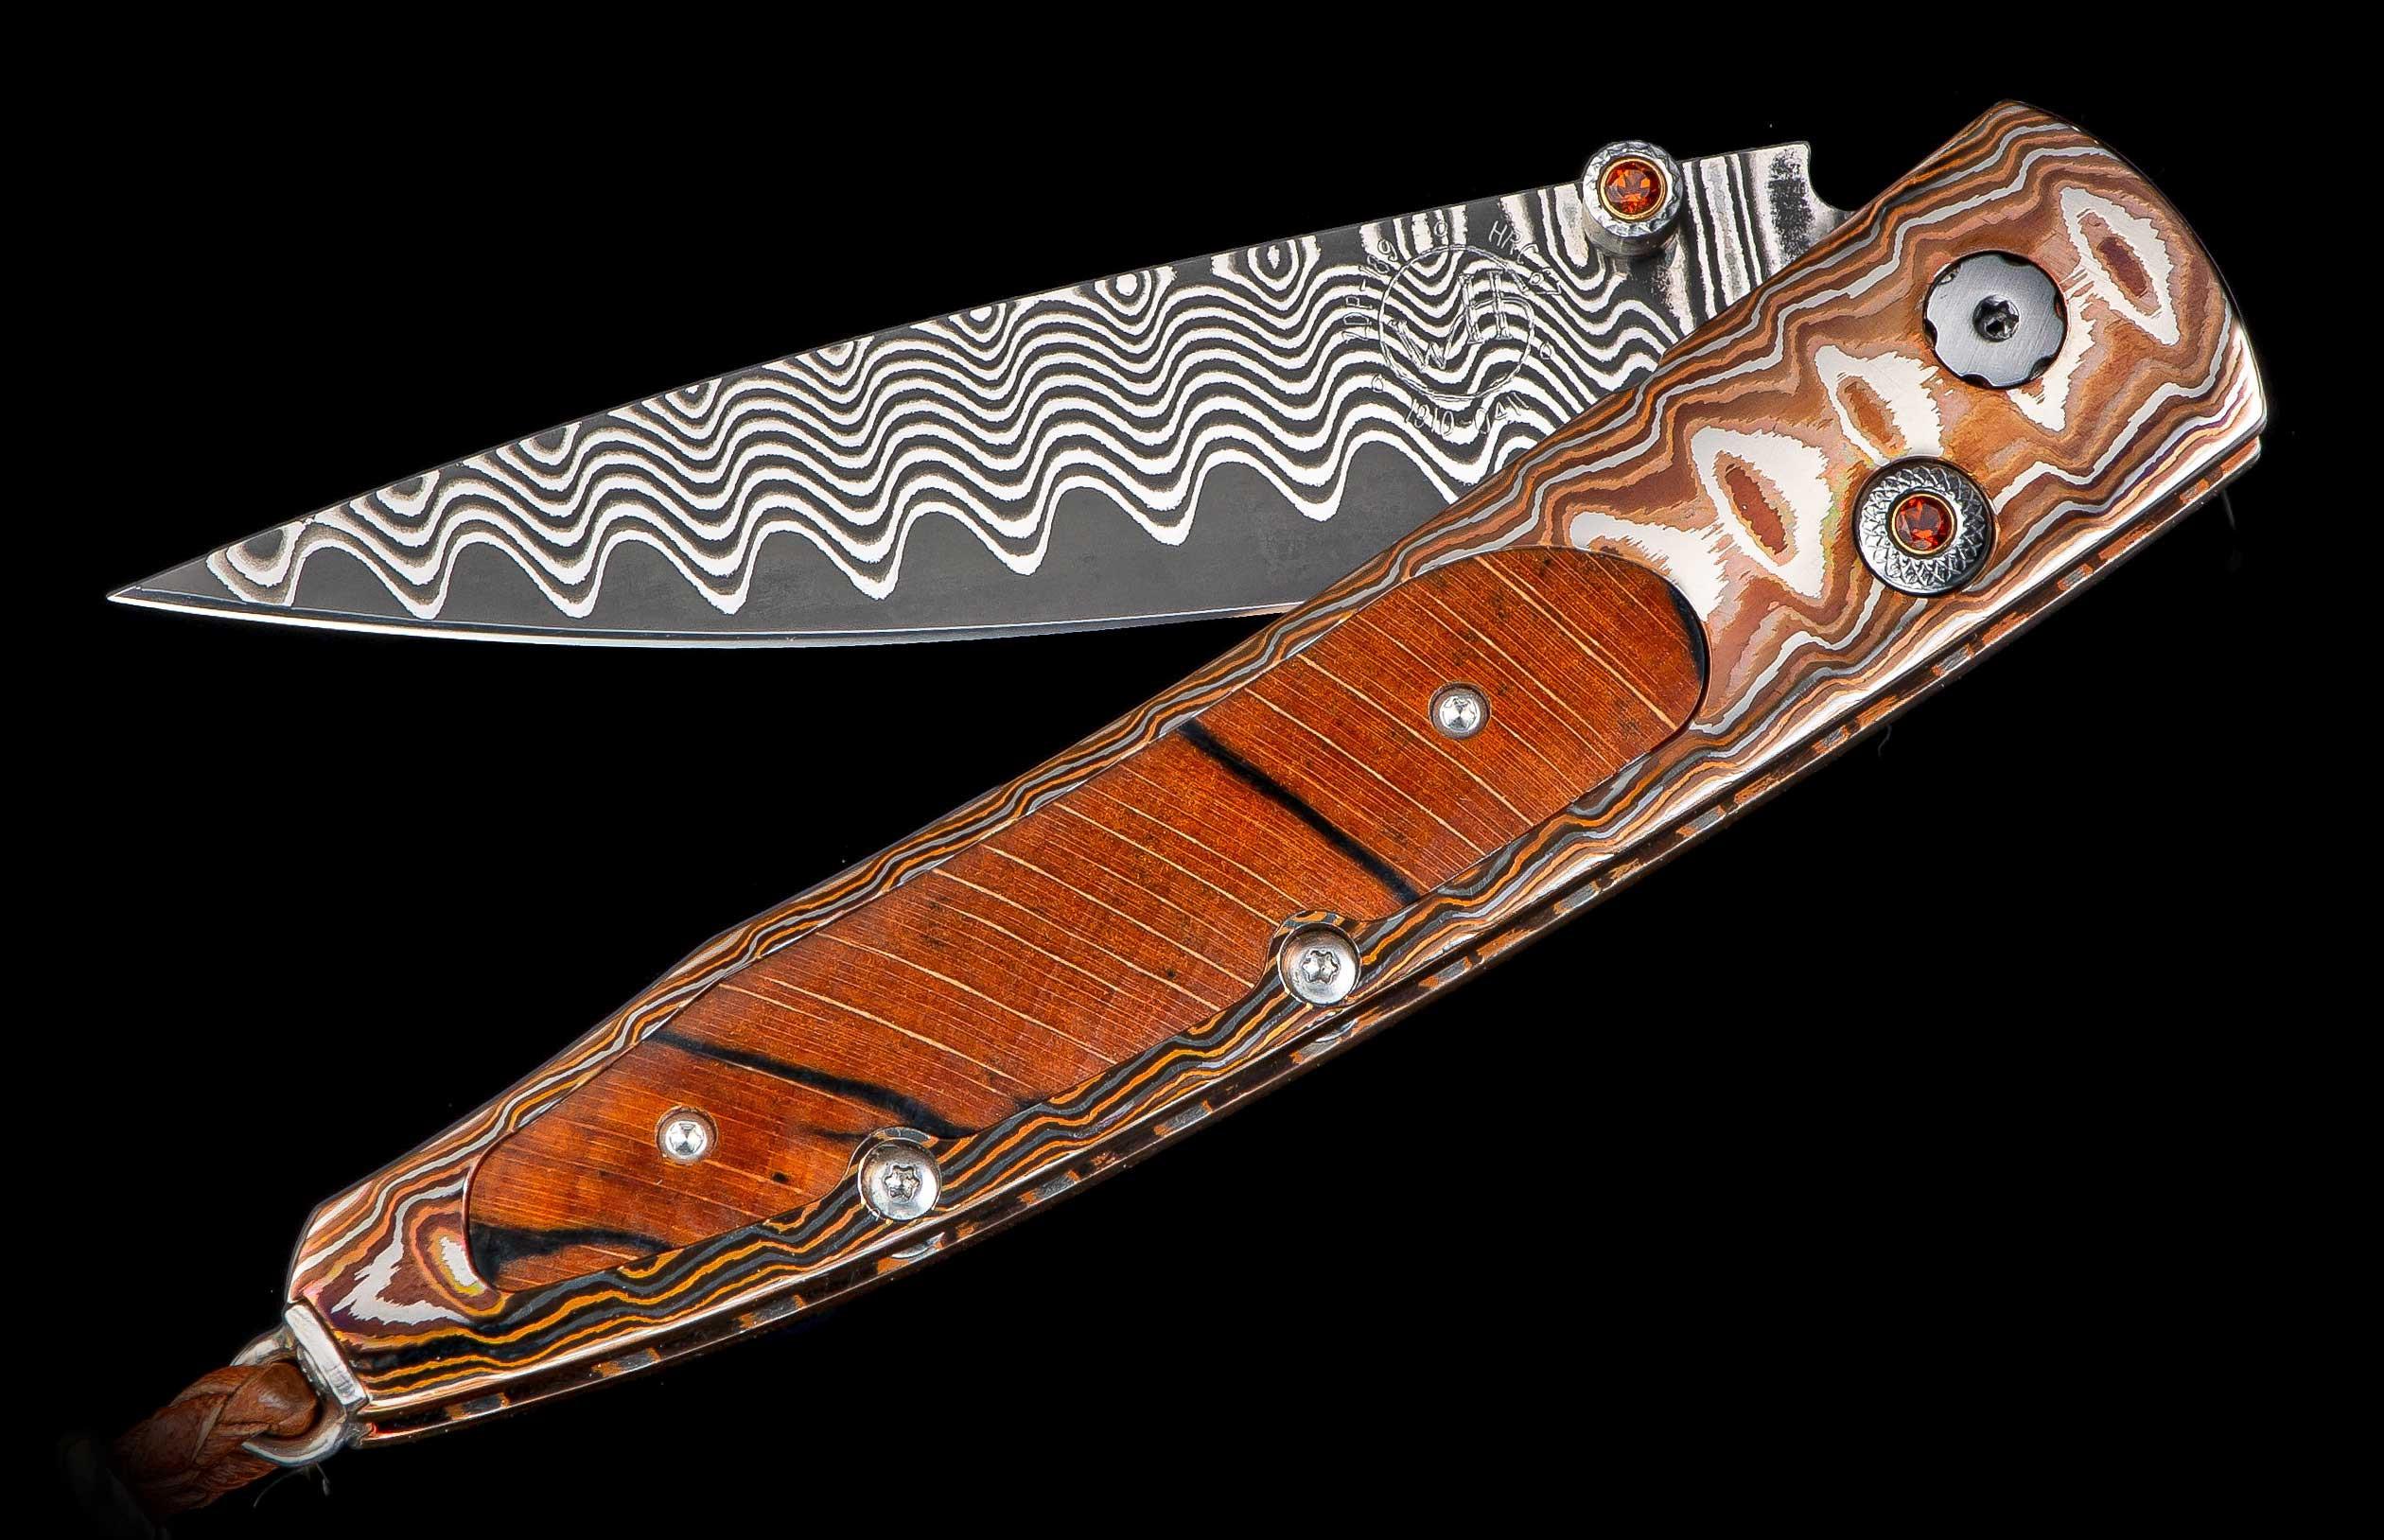 William Henry B10 Taos Knife